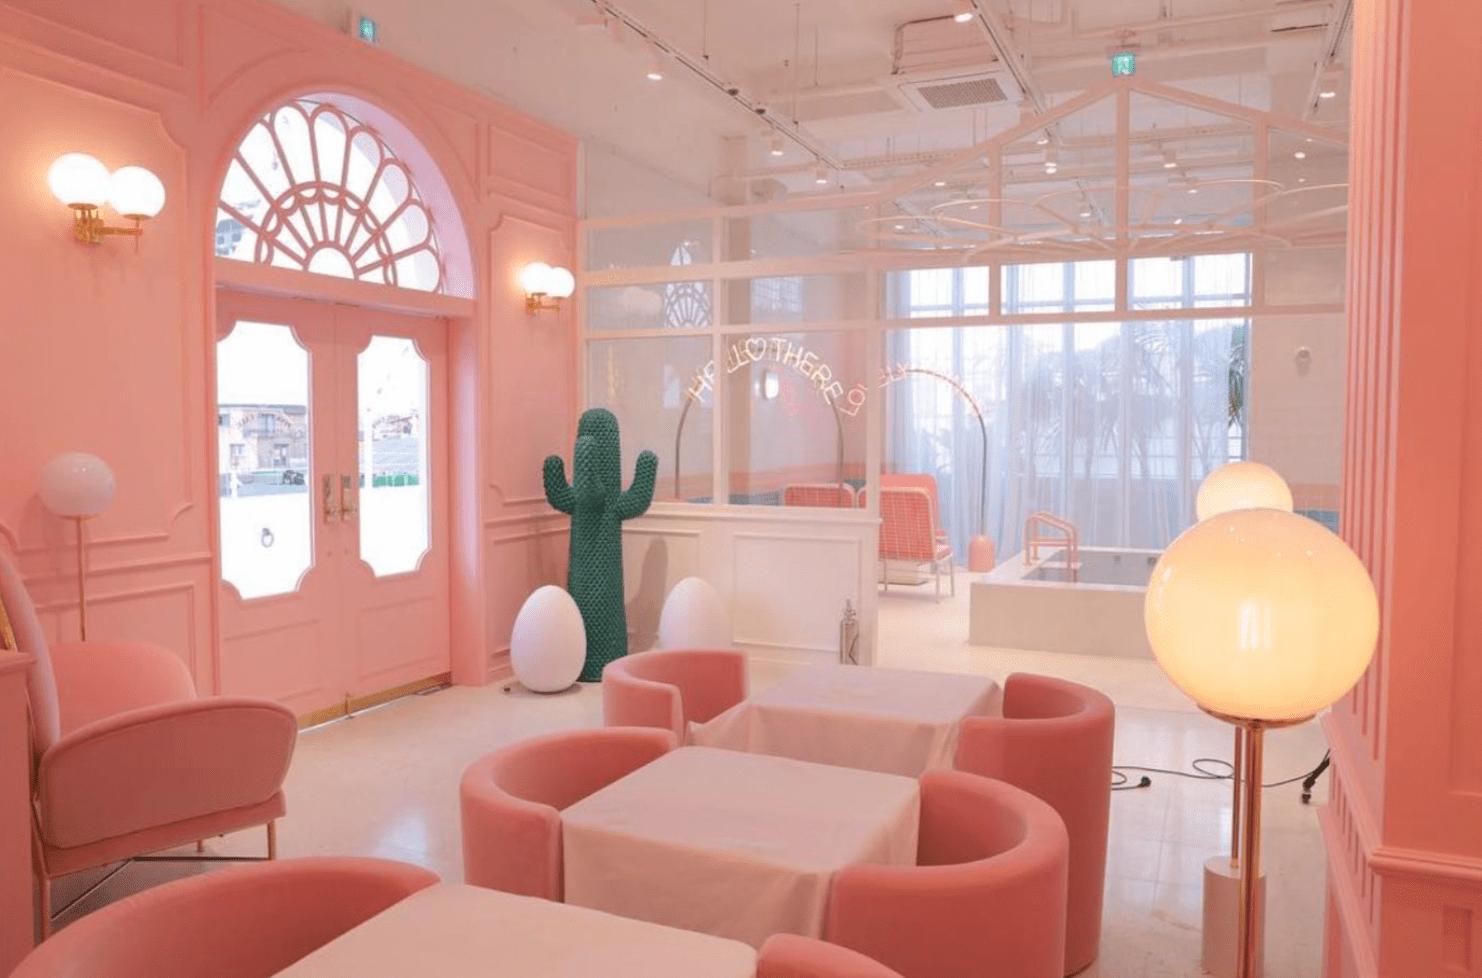 Image credit:   @pinkpoolcafe    on Instagram